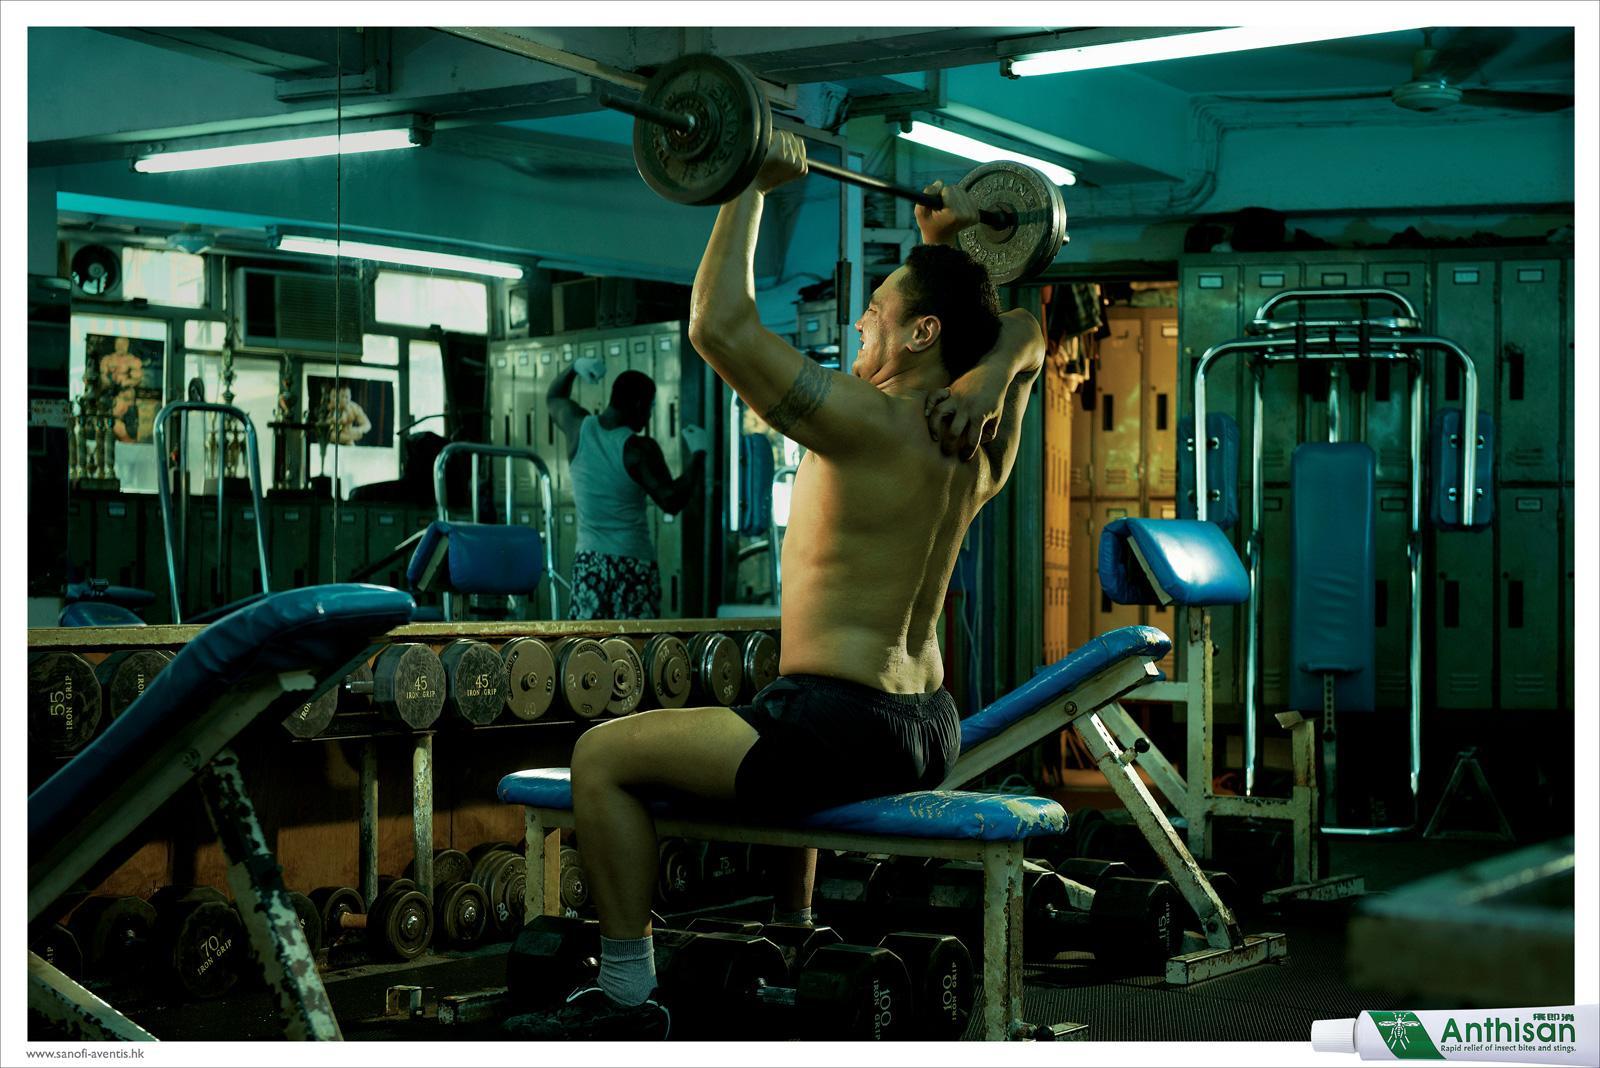 Anthisan Print Ad -  3rd Arm, Gym